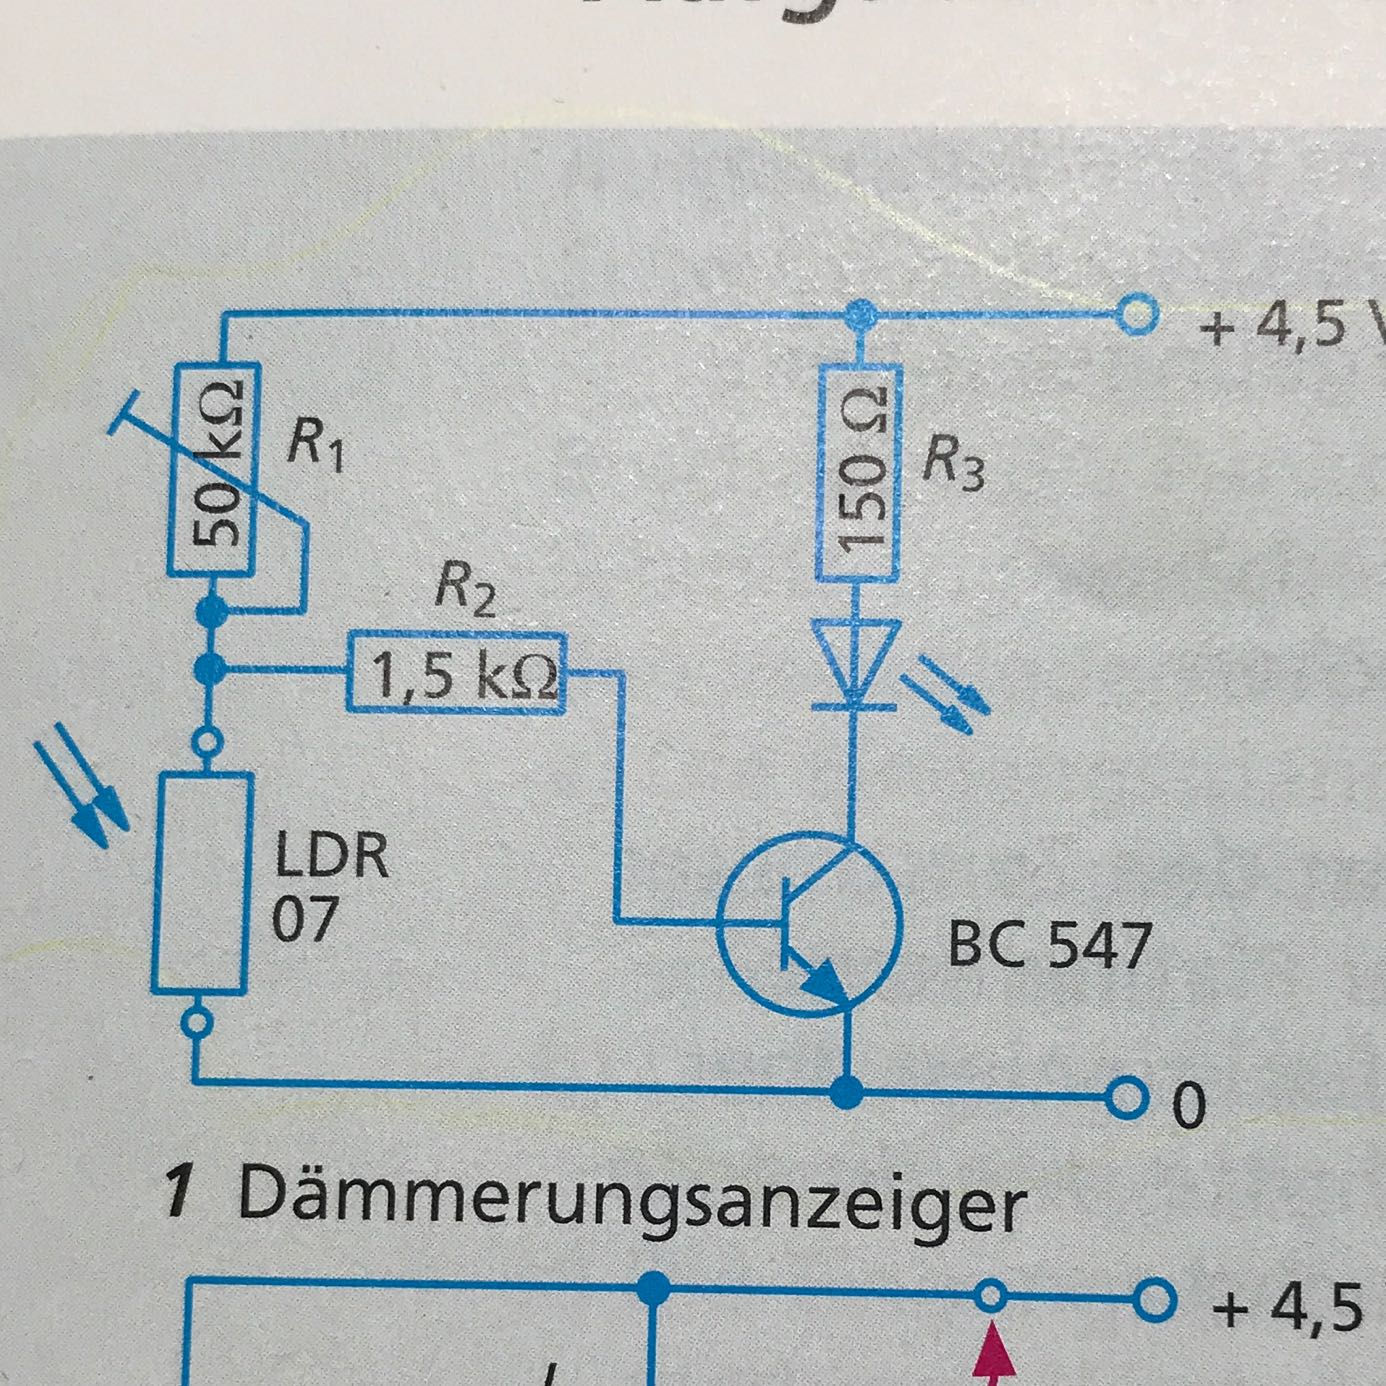 Schön Lese Elektrisch Bilder - Verdrahtungsideen - korsmi.info